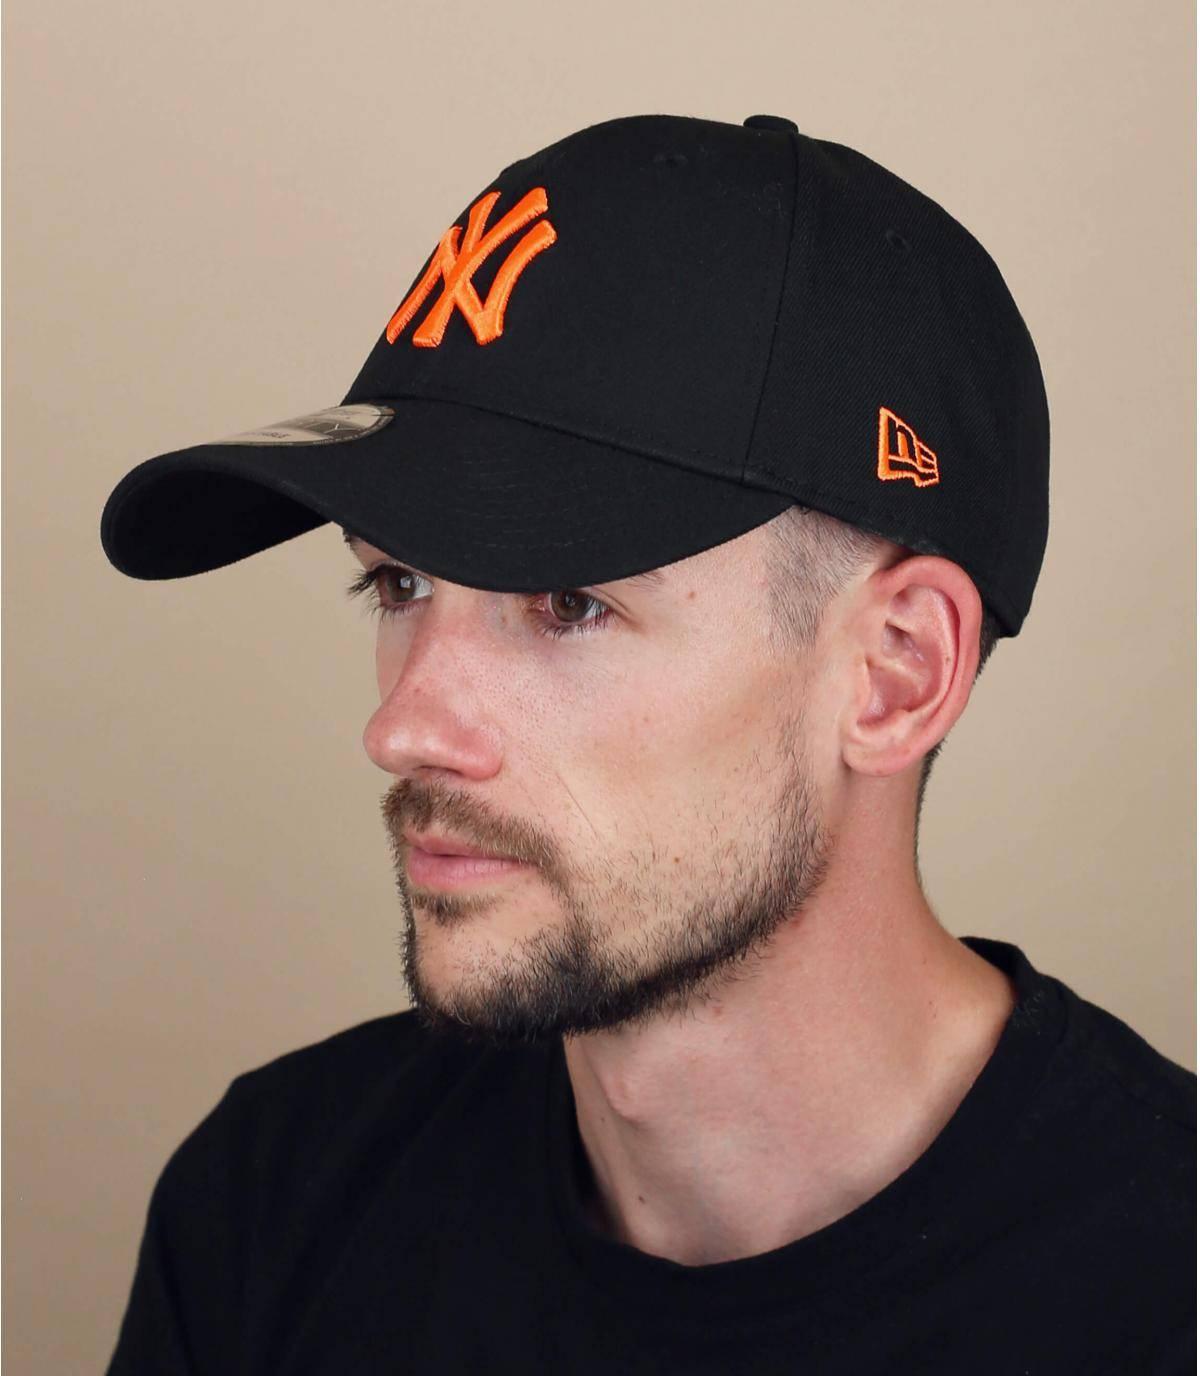 cappellino NY nero arancione